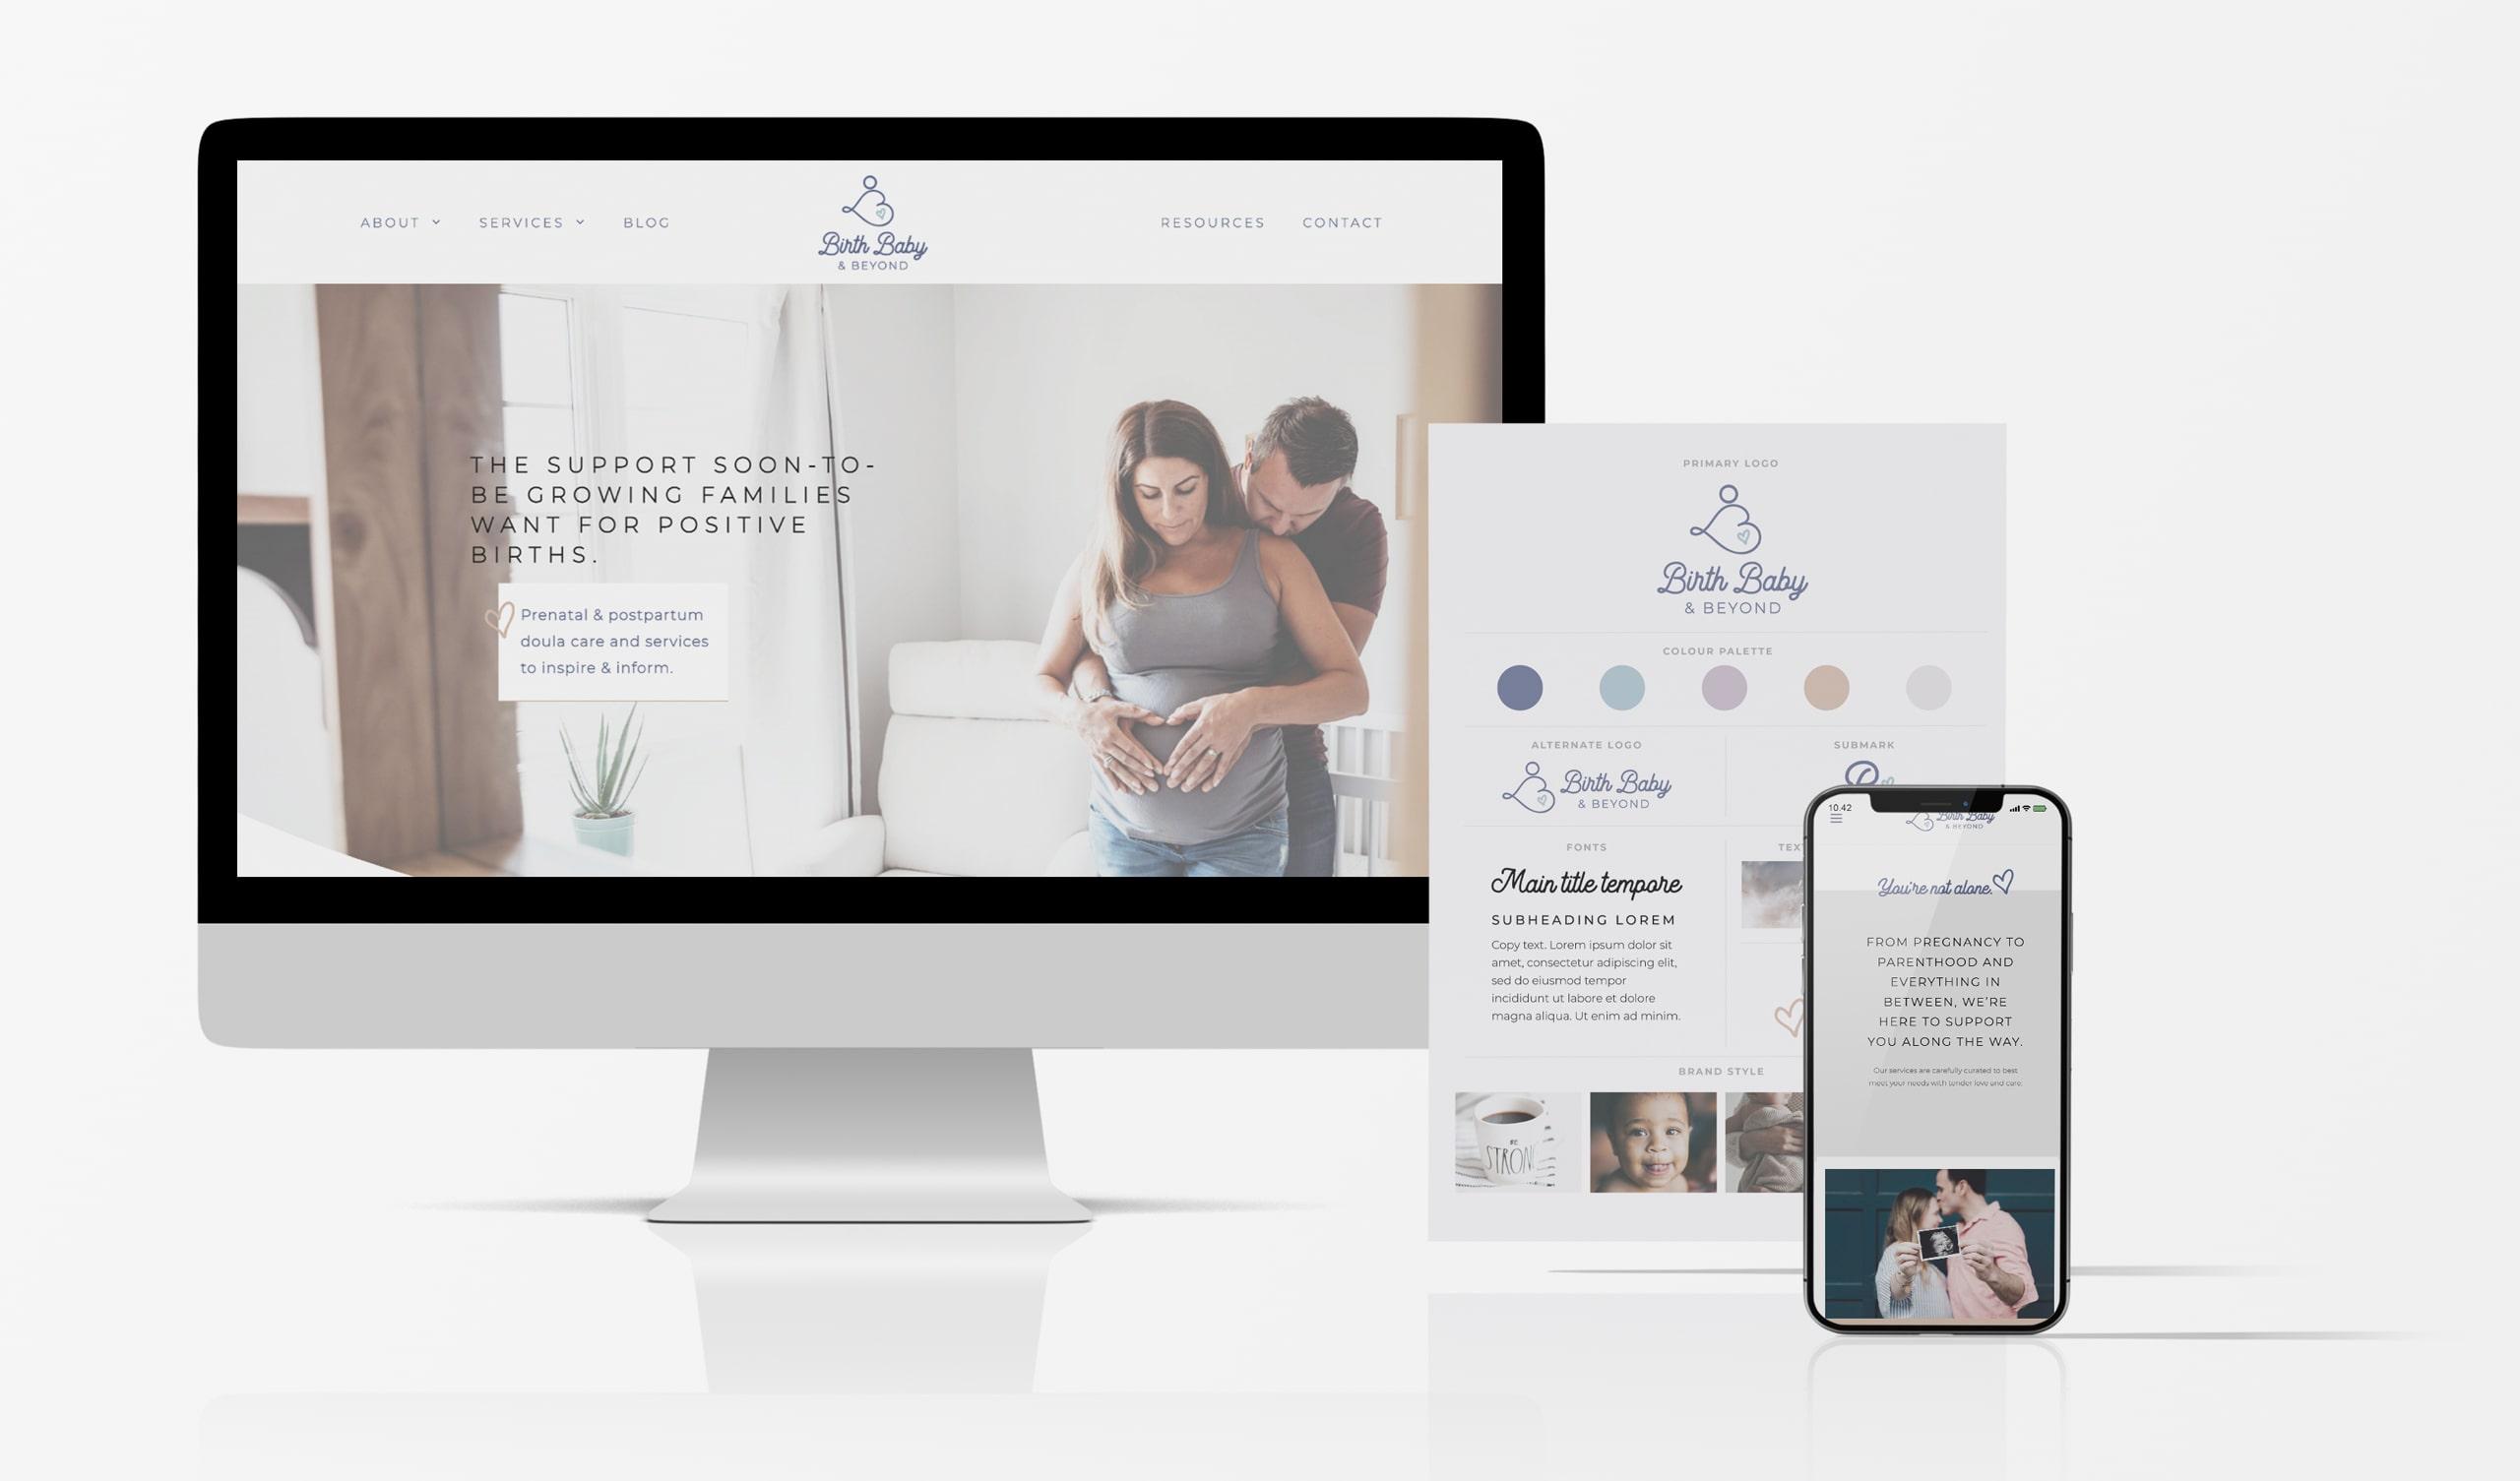 Brand Identity Design and Custom WordPress Website for Birth Baby and Beyond